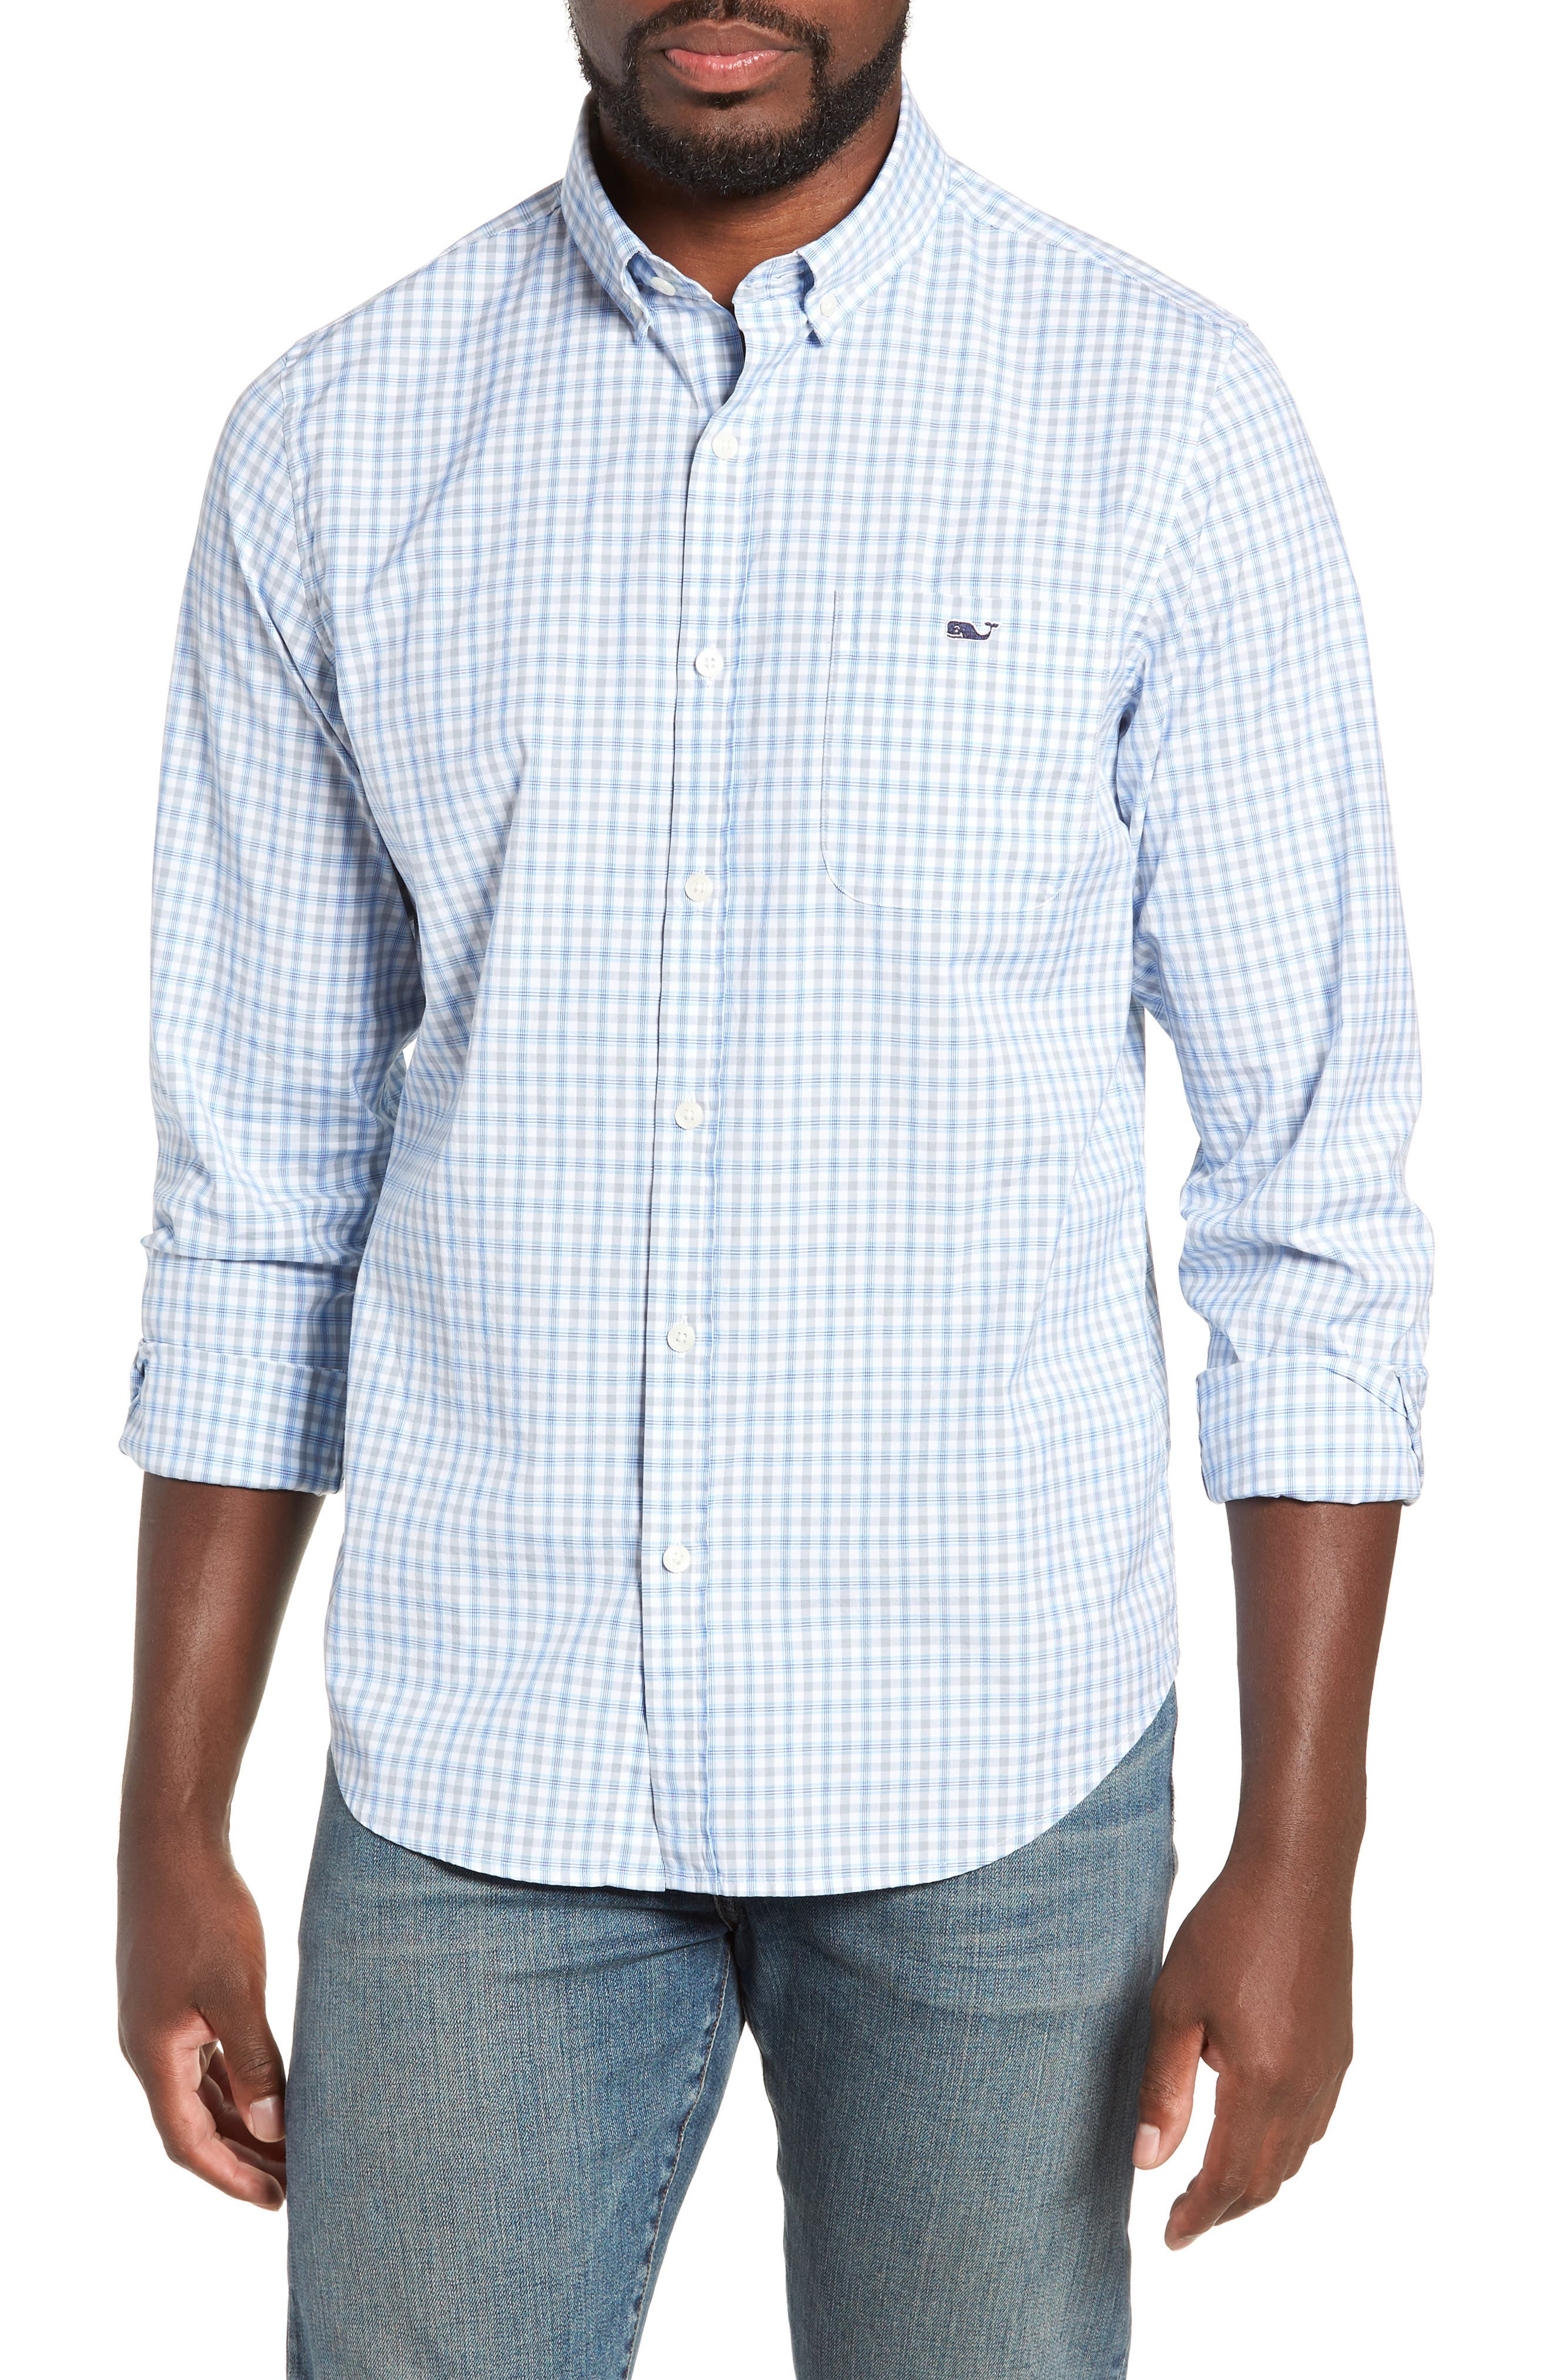 VINEYARD VINES,                             Murray Slim Fit Sport Shirt,                             Main thumbnail 1, color,                             034